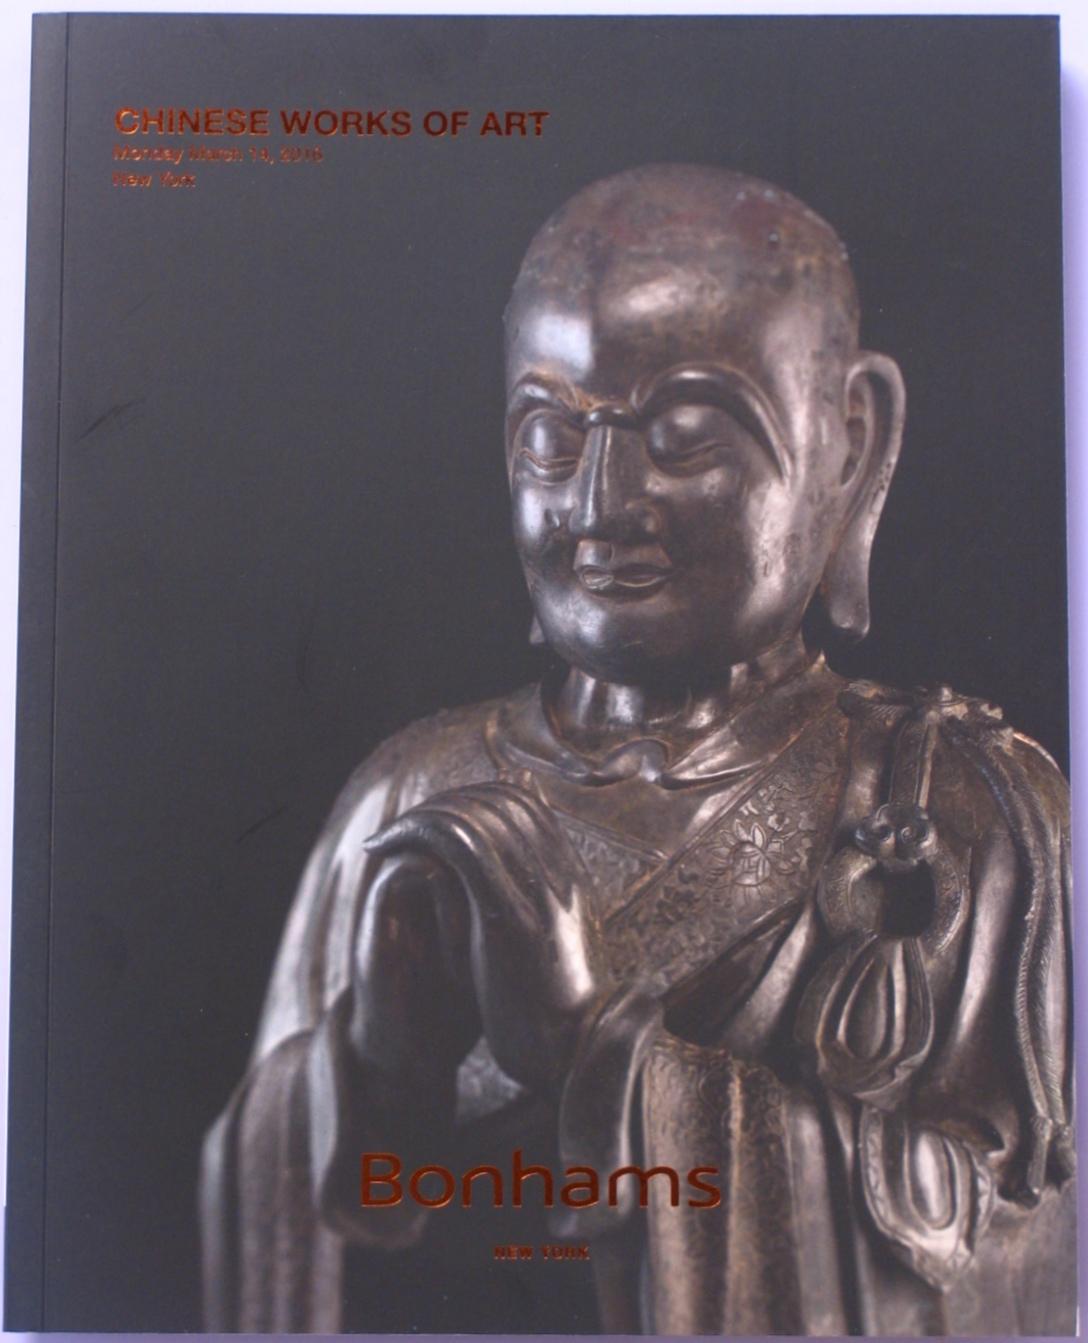 BNY20160315: Bookshop: [2016] Bonhams New York Chinese Works of Art